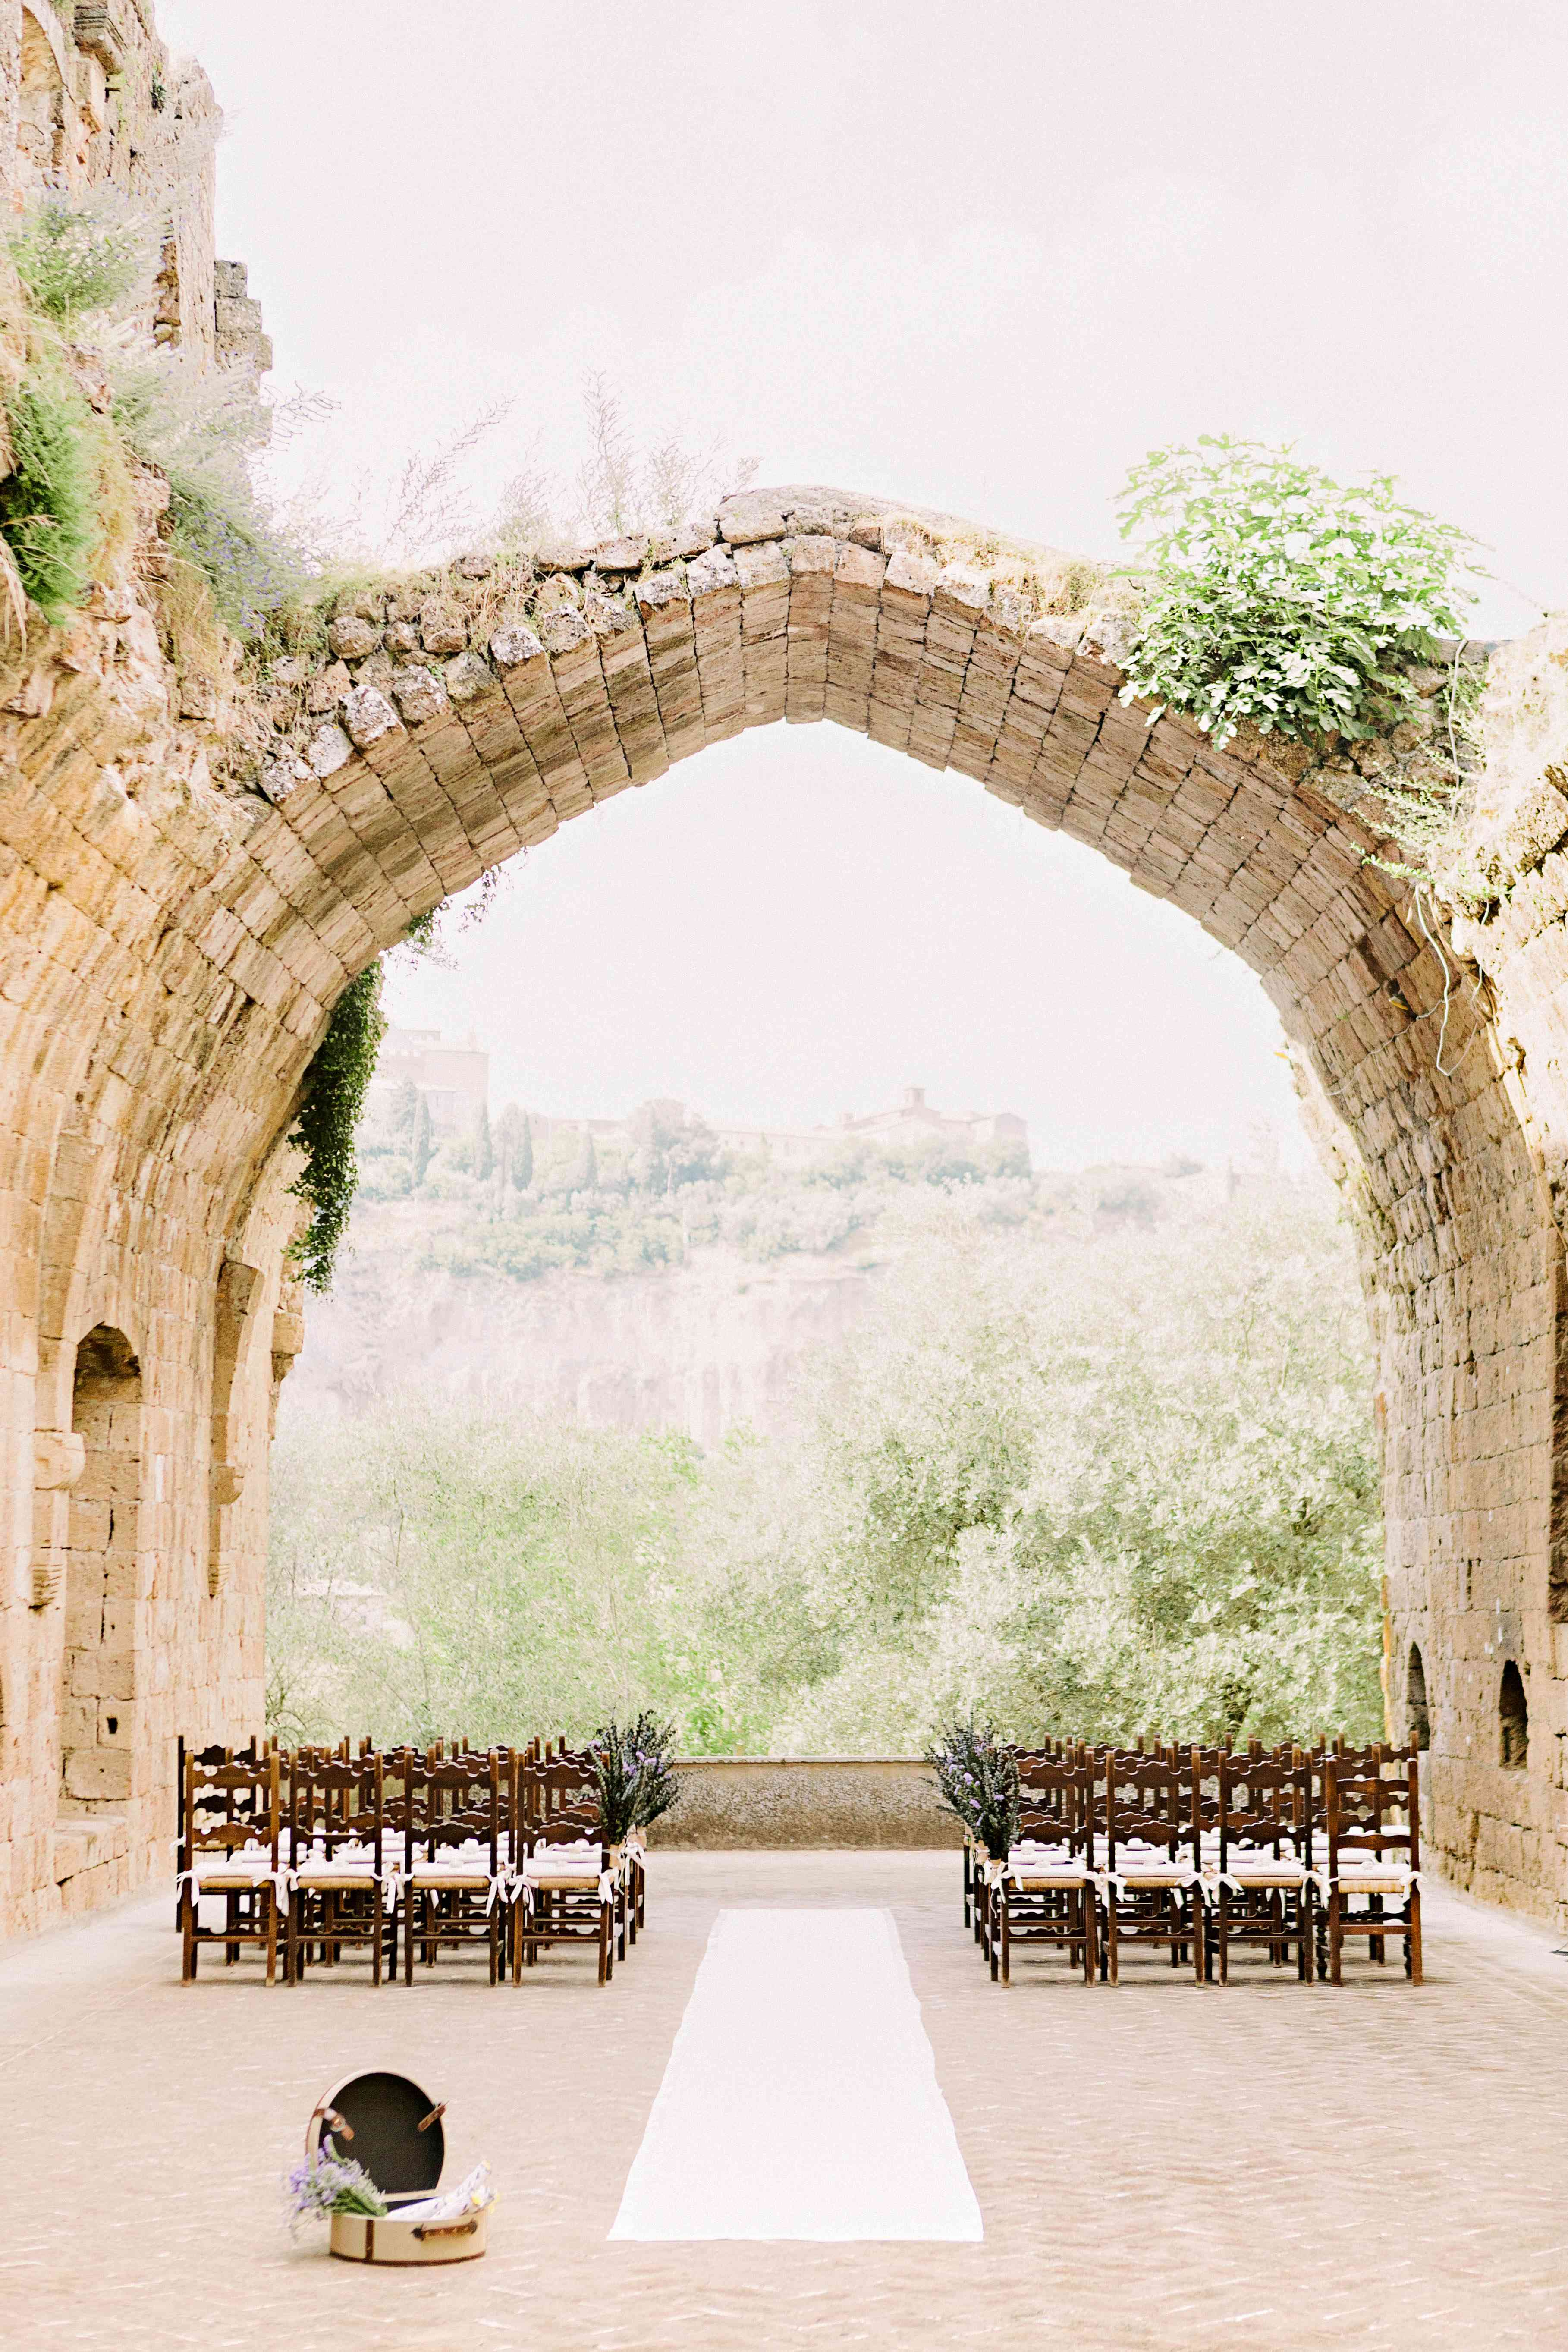 Rustic Italian wedding ceremony